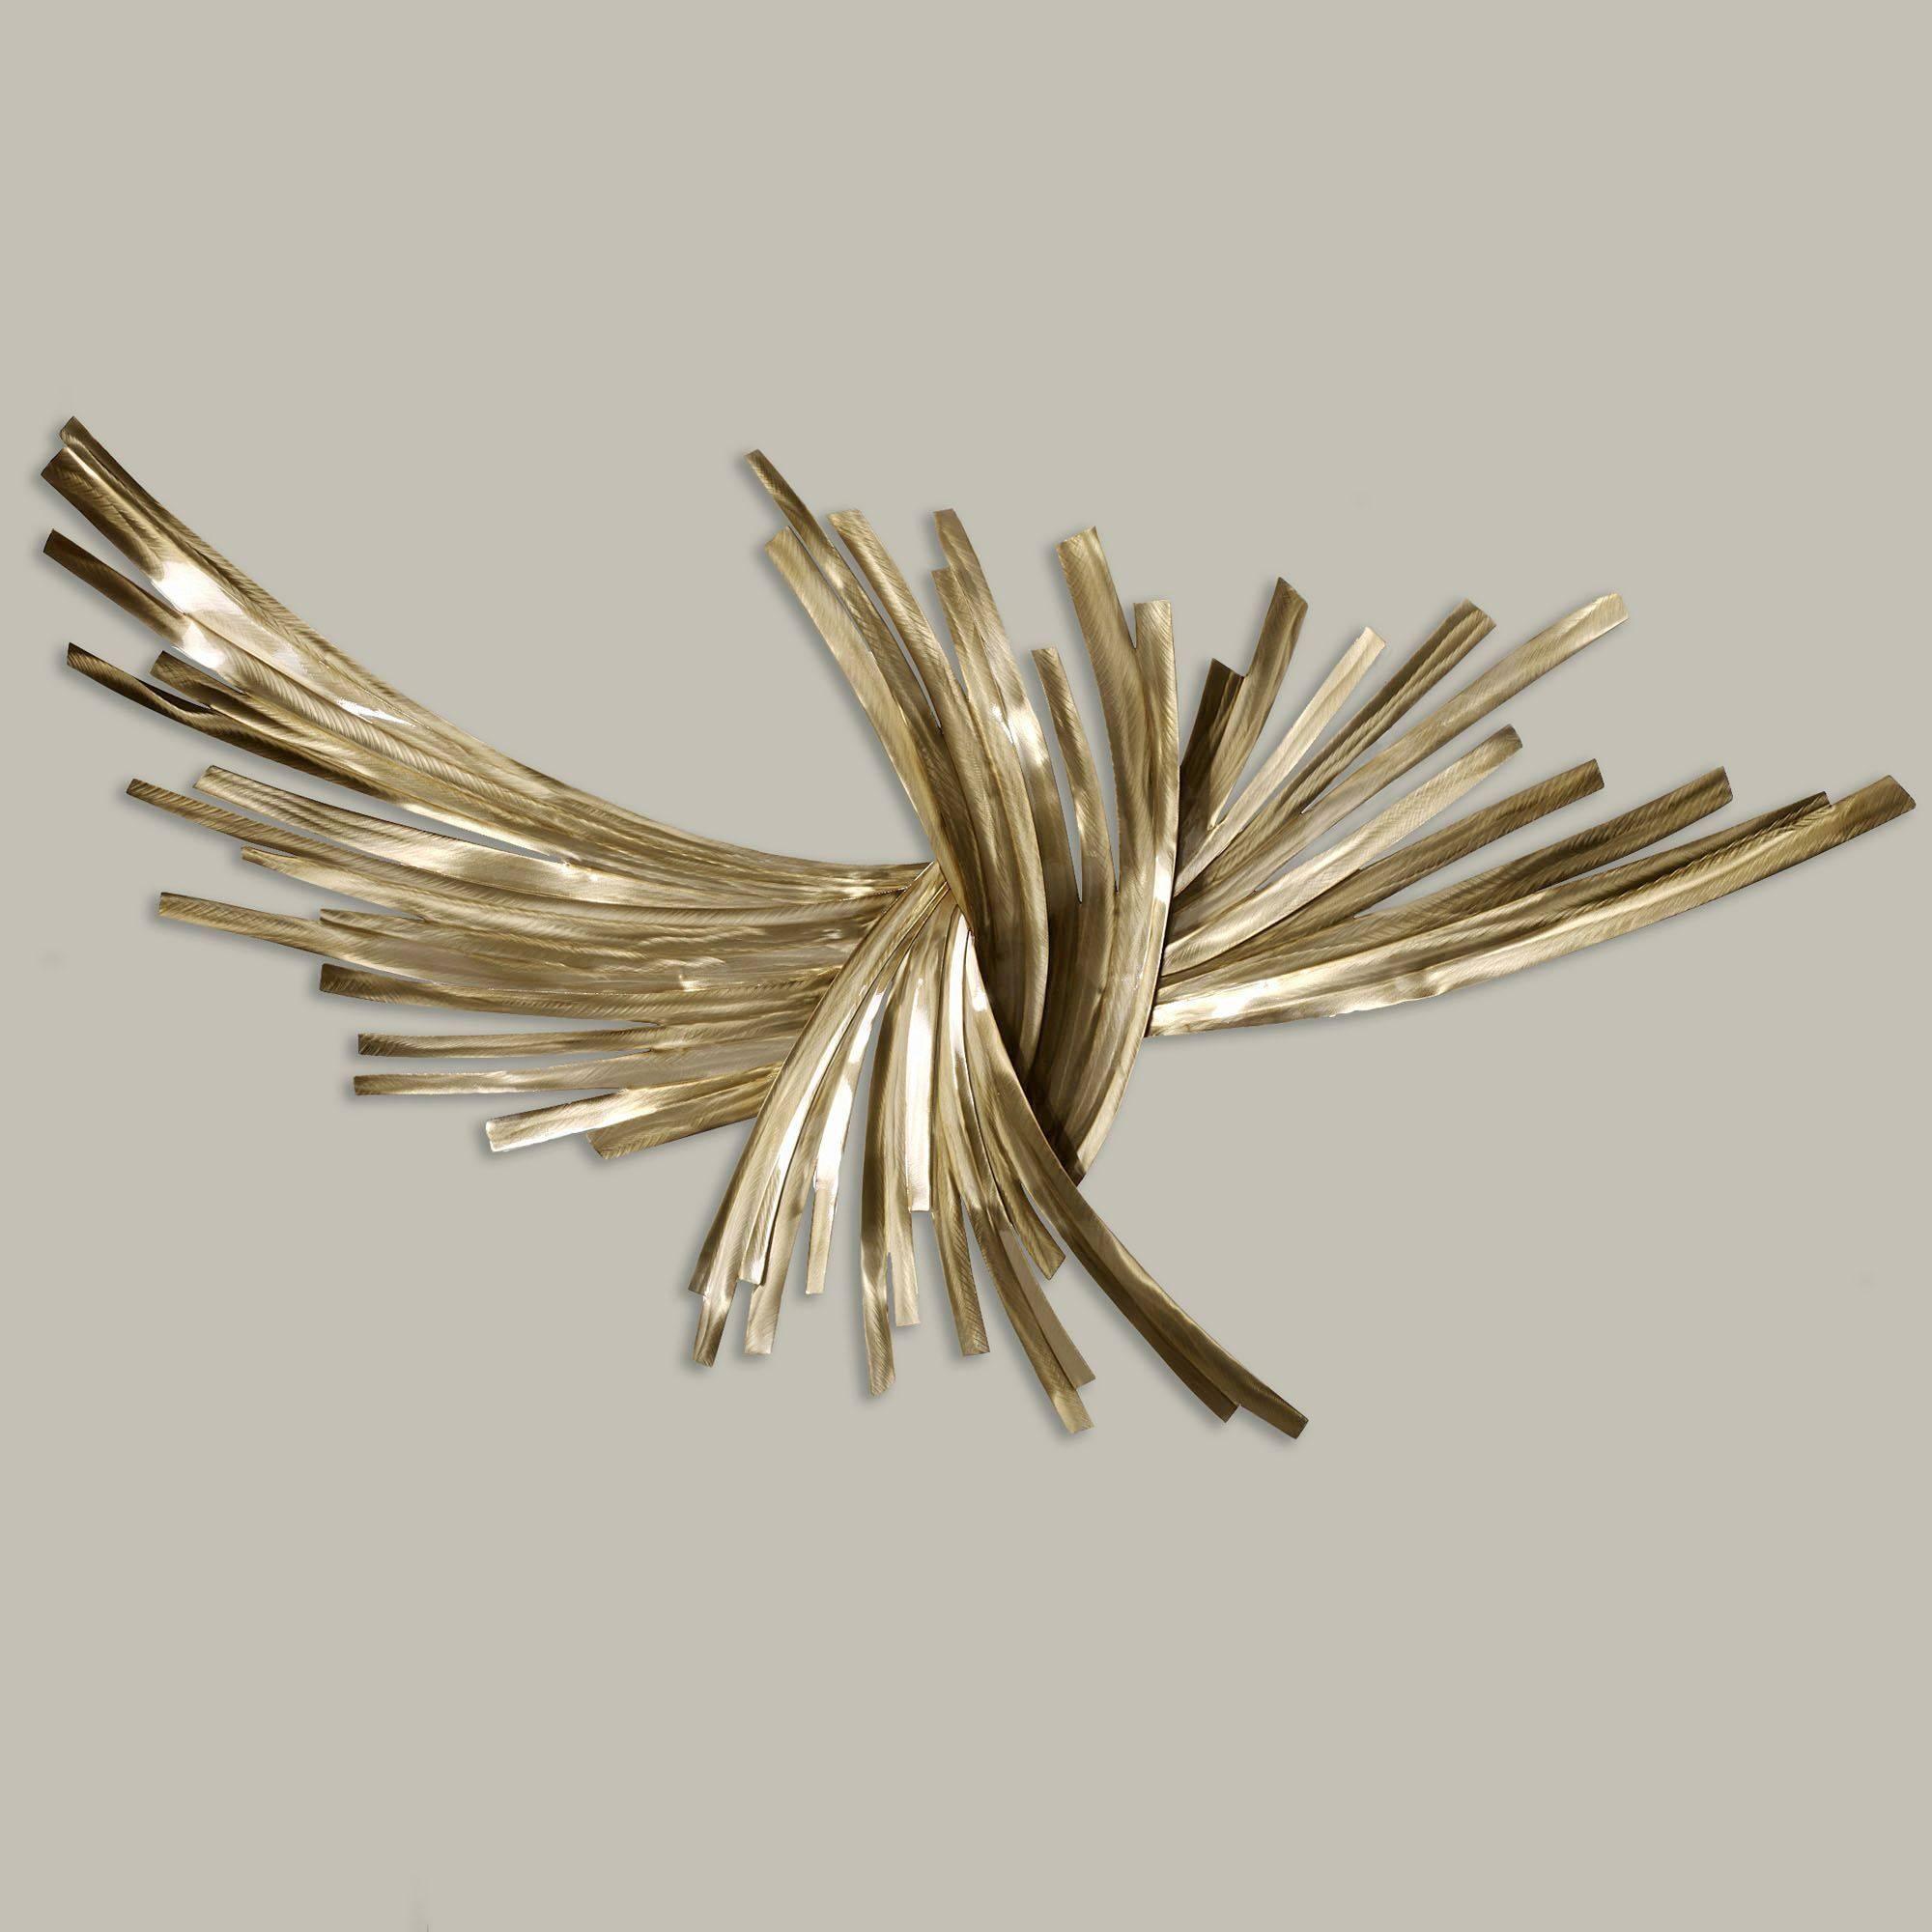 Infinity Gold Metal Wall Sculpture Inside 2018 Gold Metal Wall Art (Gallery 1 of 20)